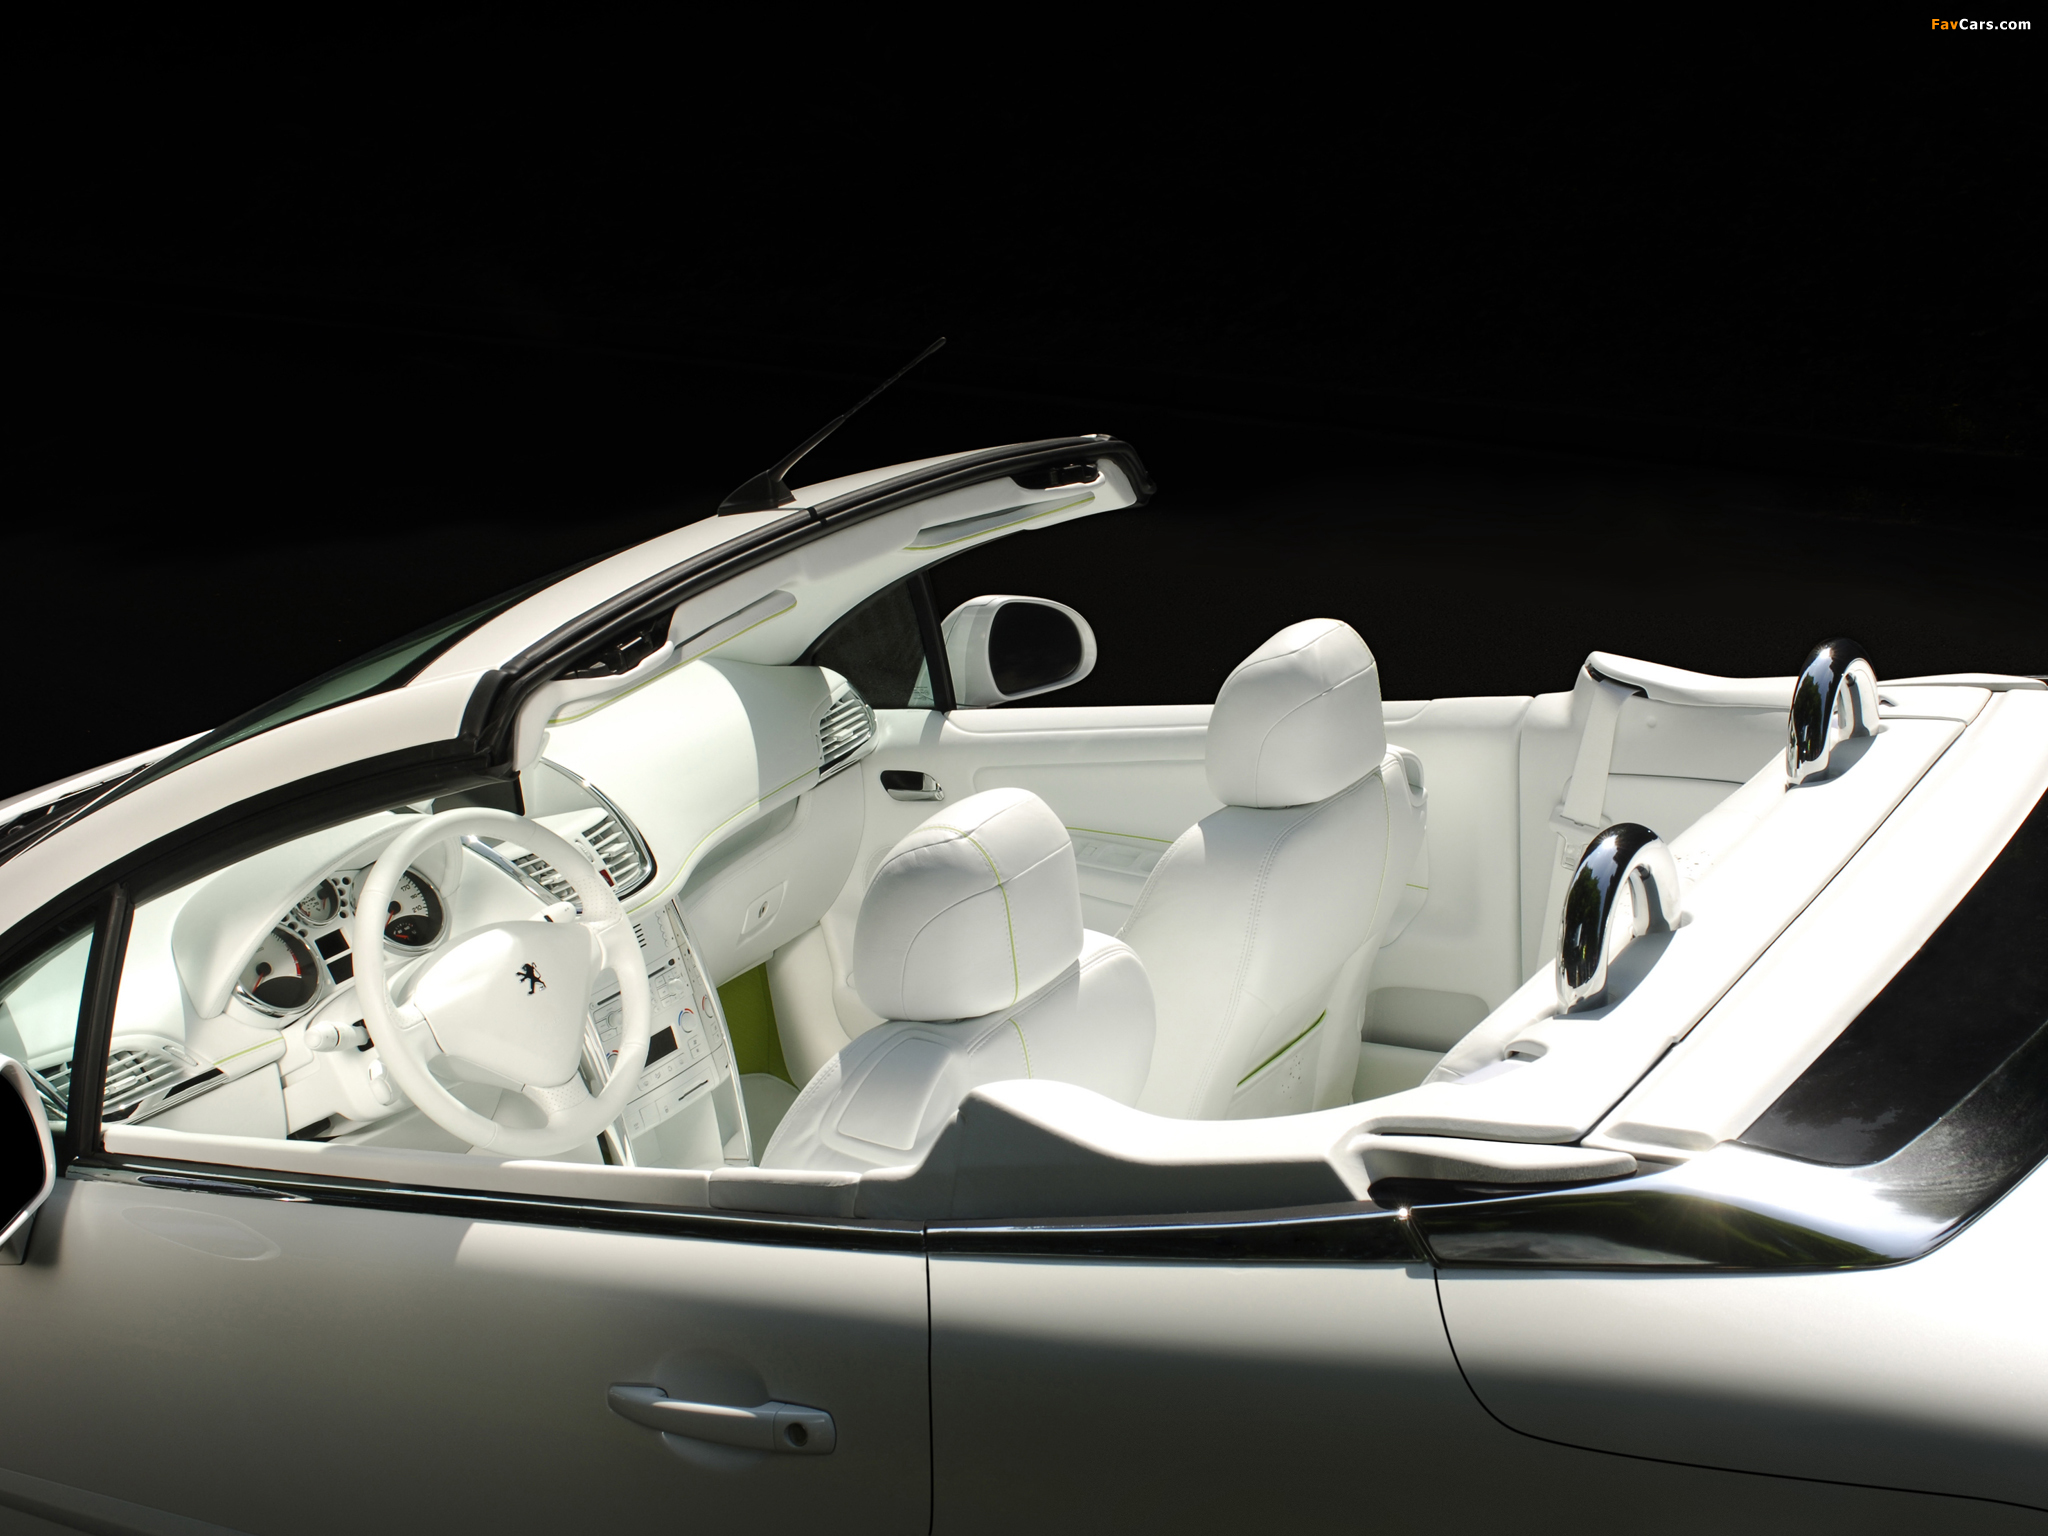 Peugeot 207 Epure Concept 2006 pictures (2048 x 1536)